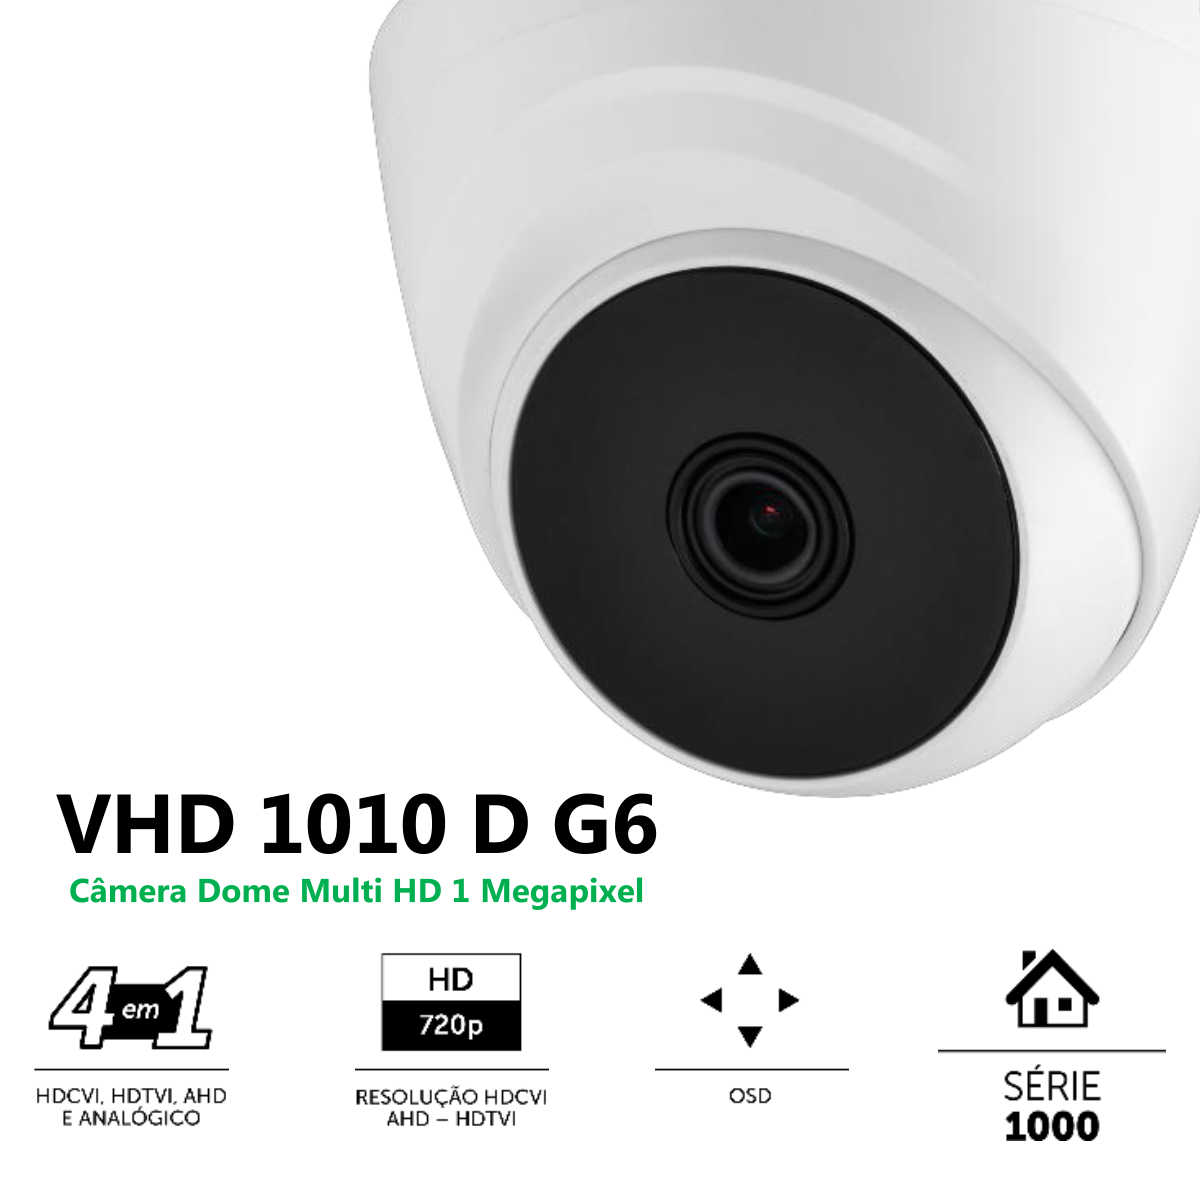 camera-dome-infravermelho-4-mp-intelbras-vhd-3420-d-g4-ultra-hd-2k-hdcvi